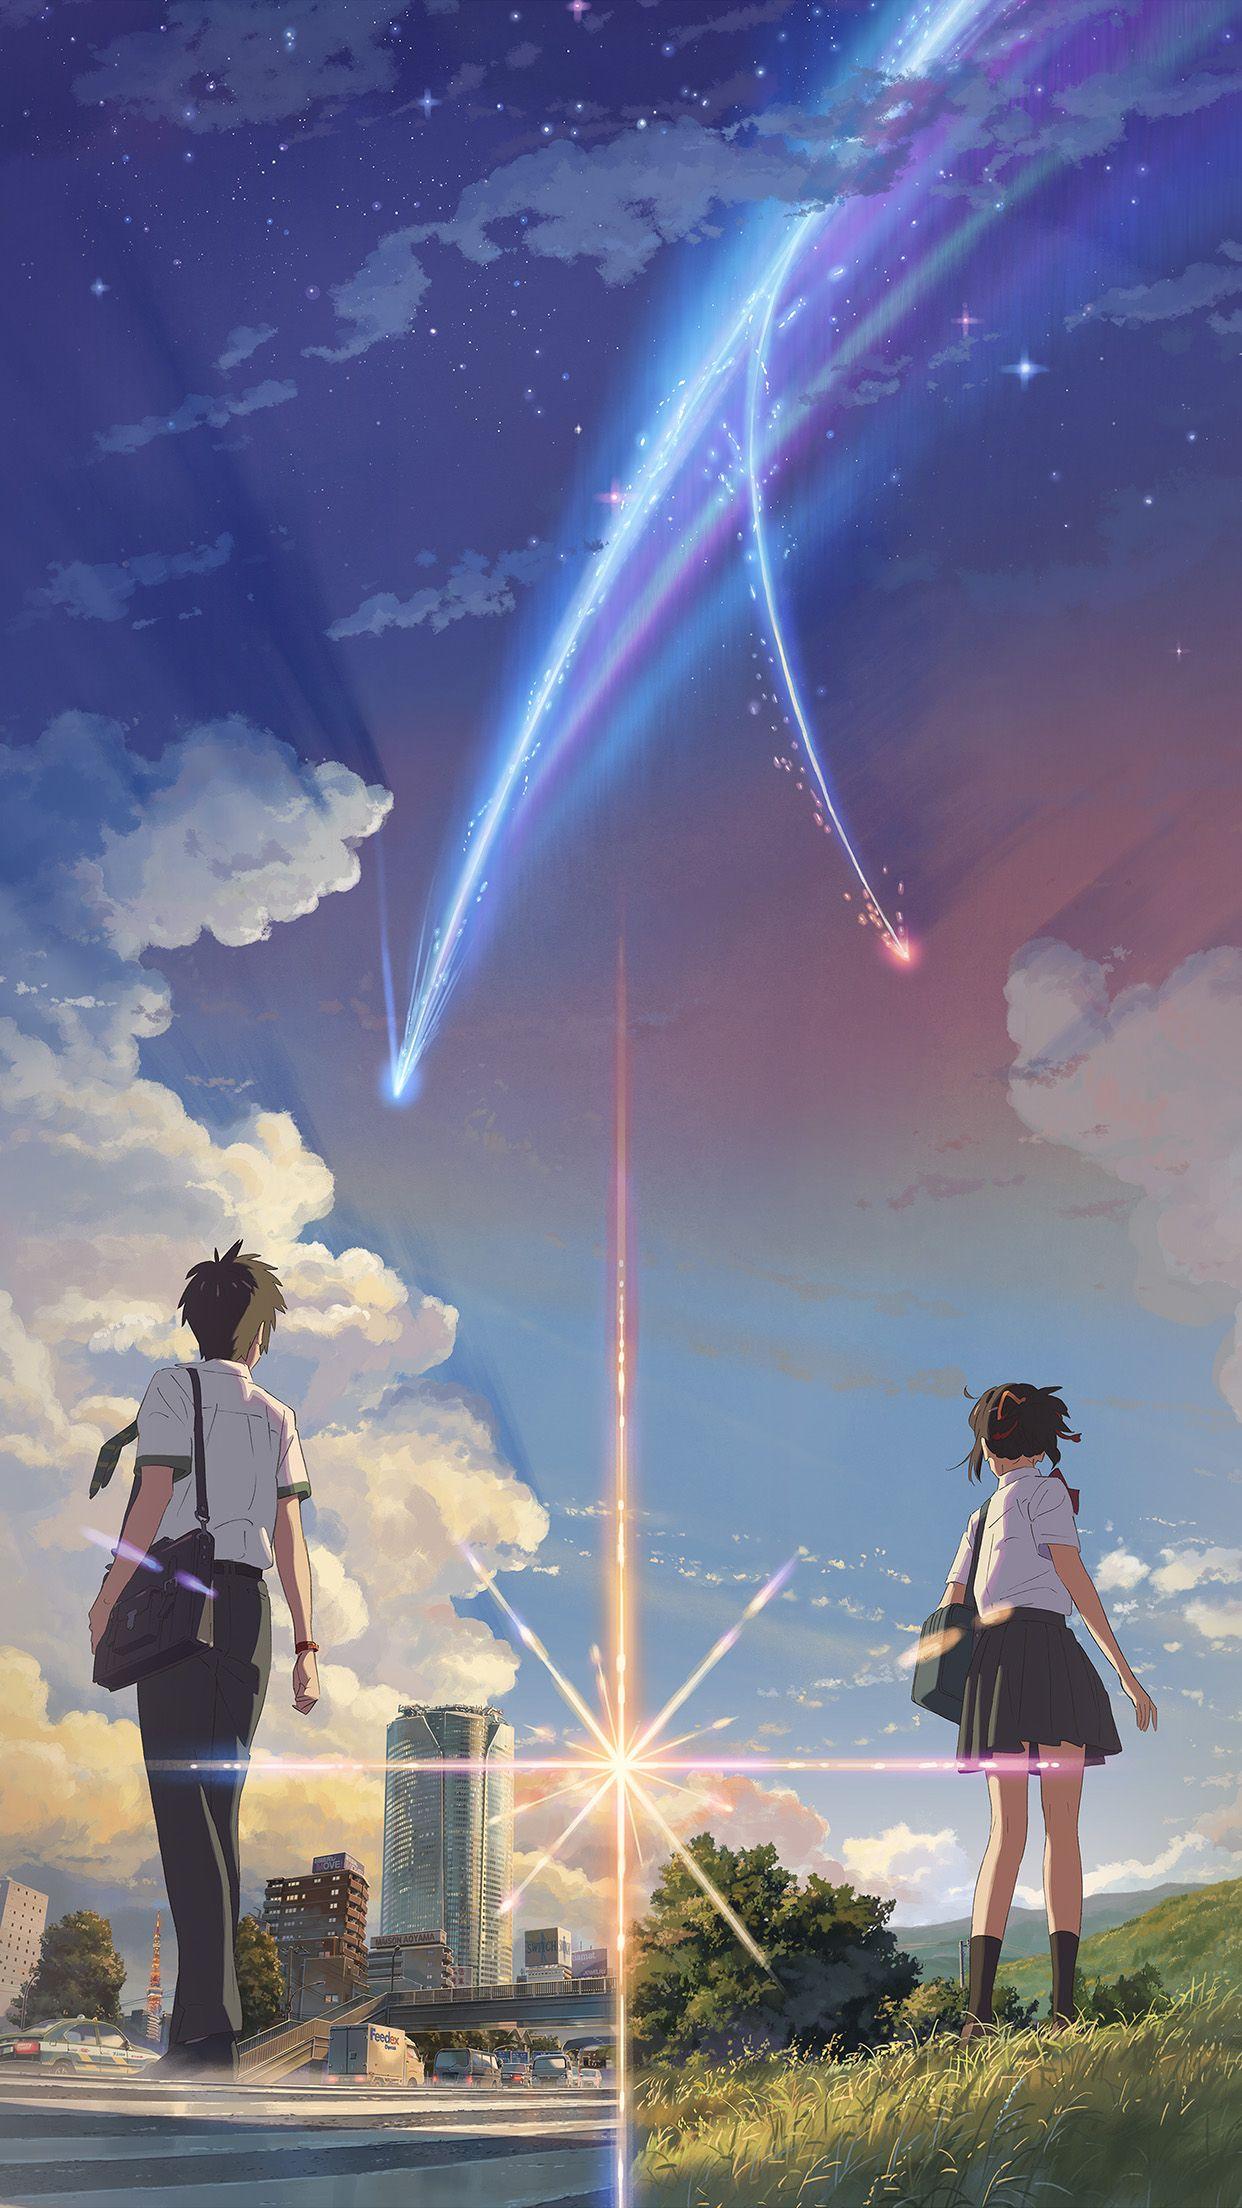 Boy And Girl Anime Art Spring Cute Iphone6 Plus Wallpaper Mobile Wallpapers Gambar Anime Jepang Gambar